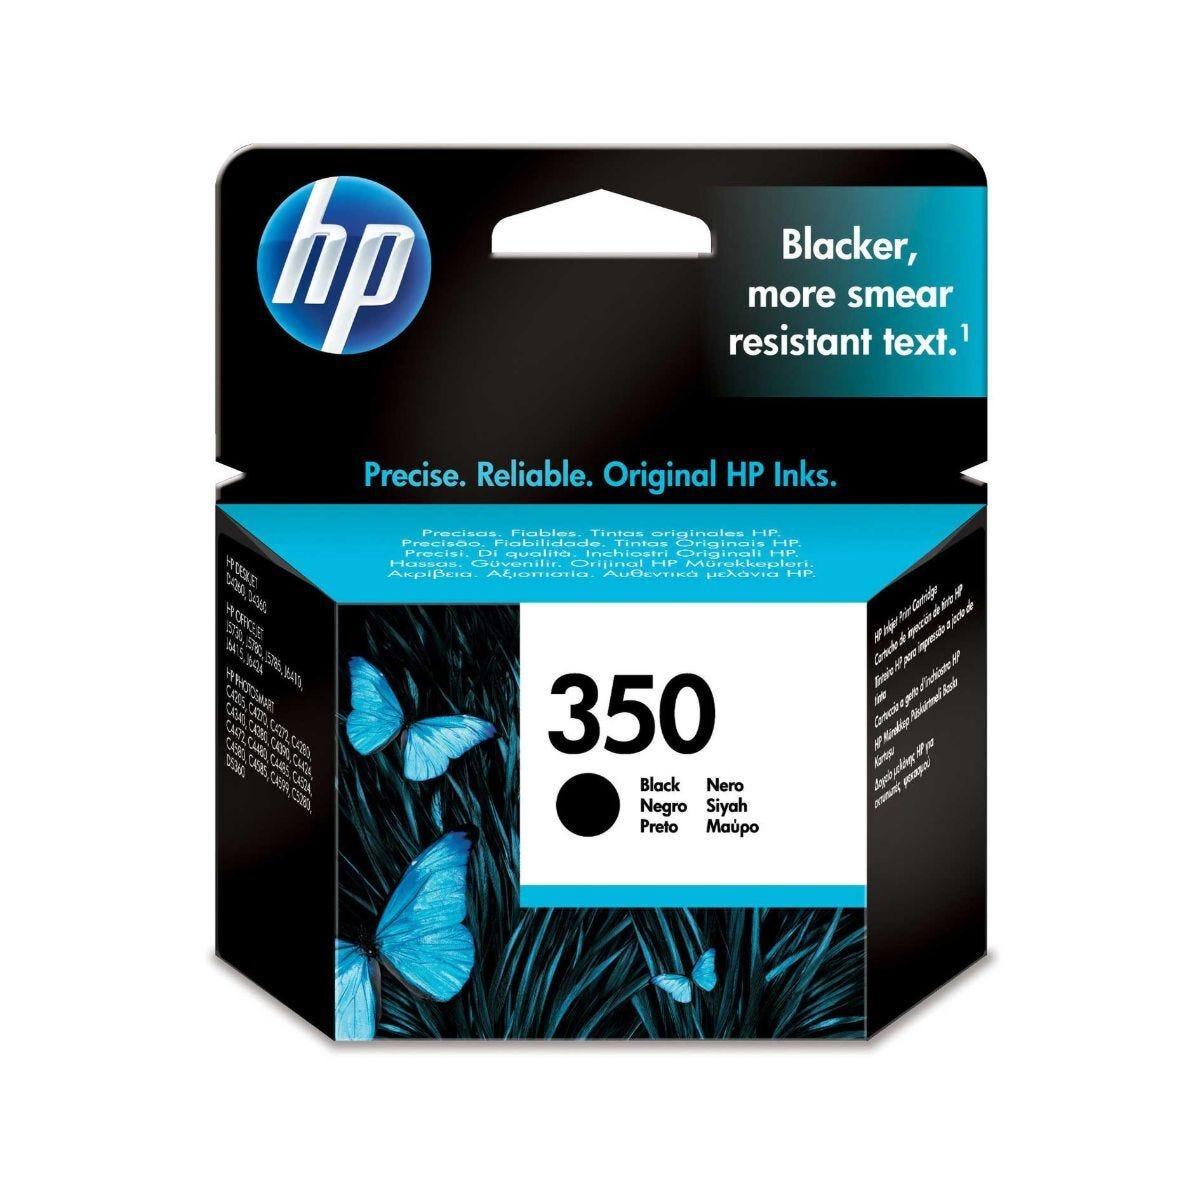 HP 350 Ink Cartridge 4.5ml